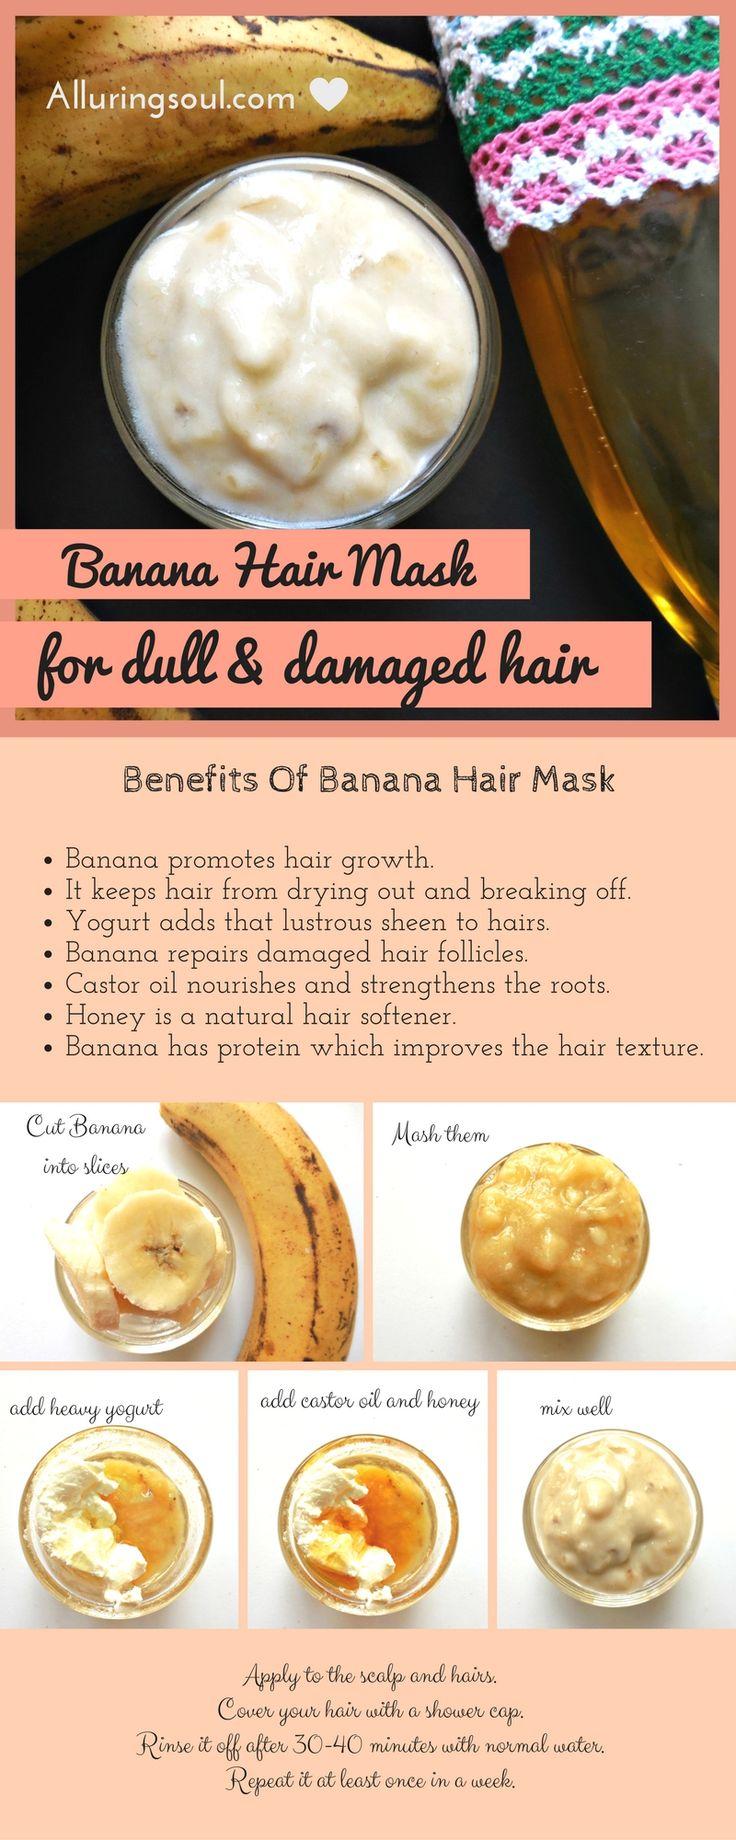 Diy Hair Care Tips Banana Hair Mask Is Best For Hair As